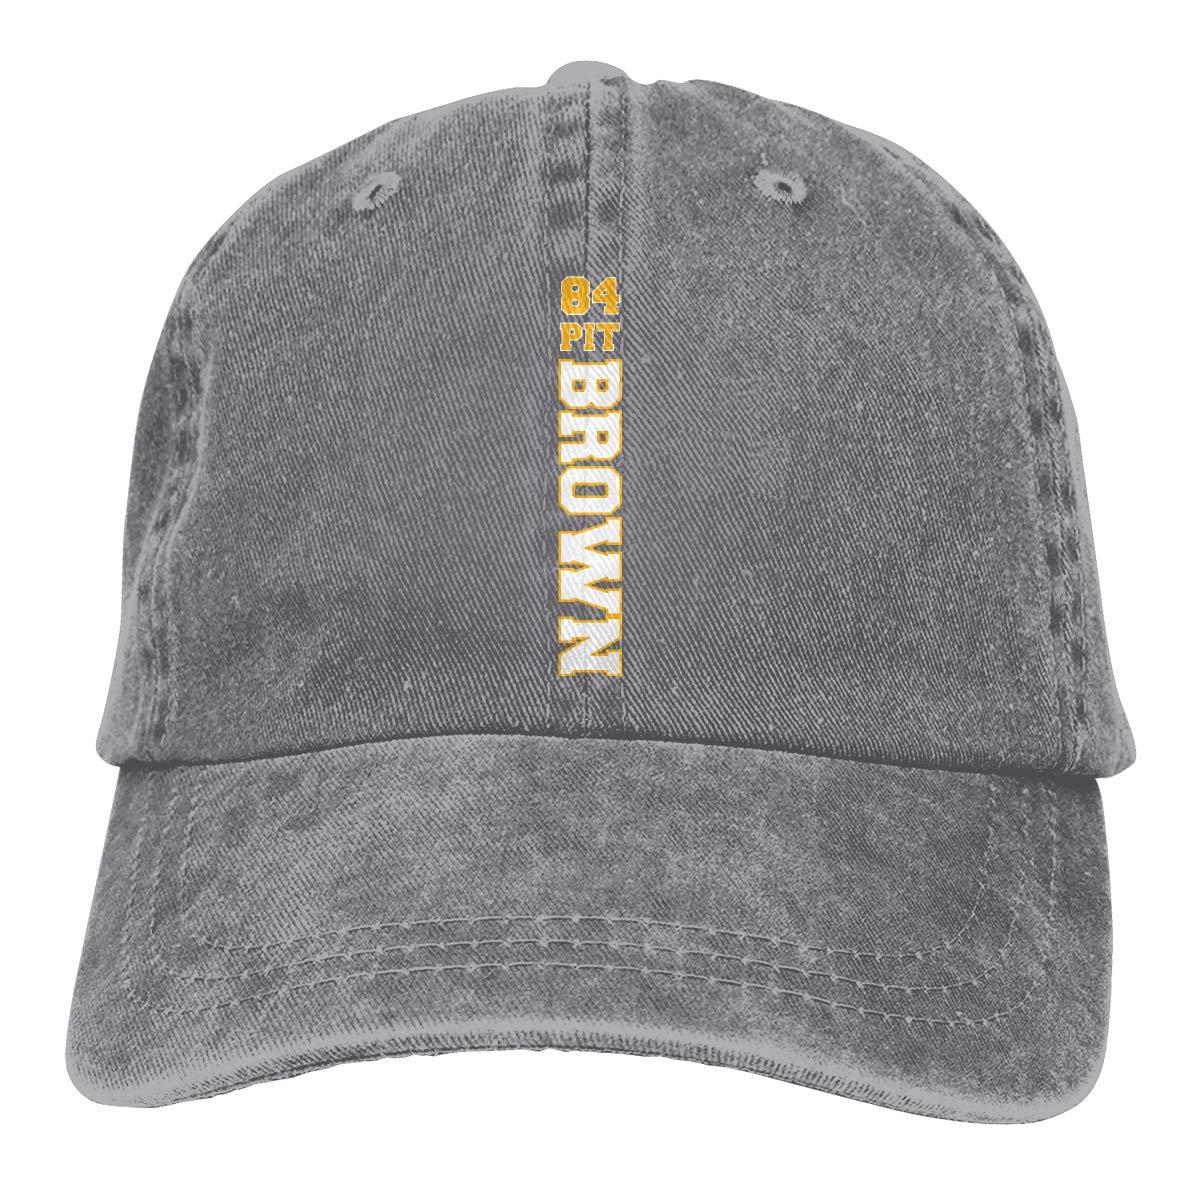 DeniCar Unisex Adjustable Baseball Caps Antonio-Brown-Logo Cowboy Skull Cap